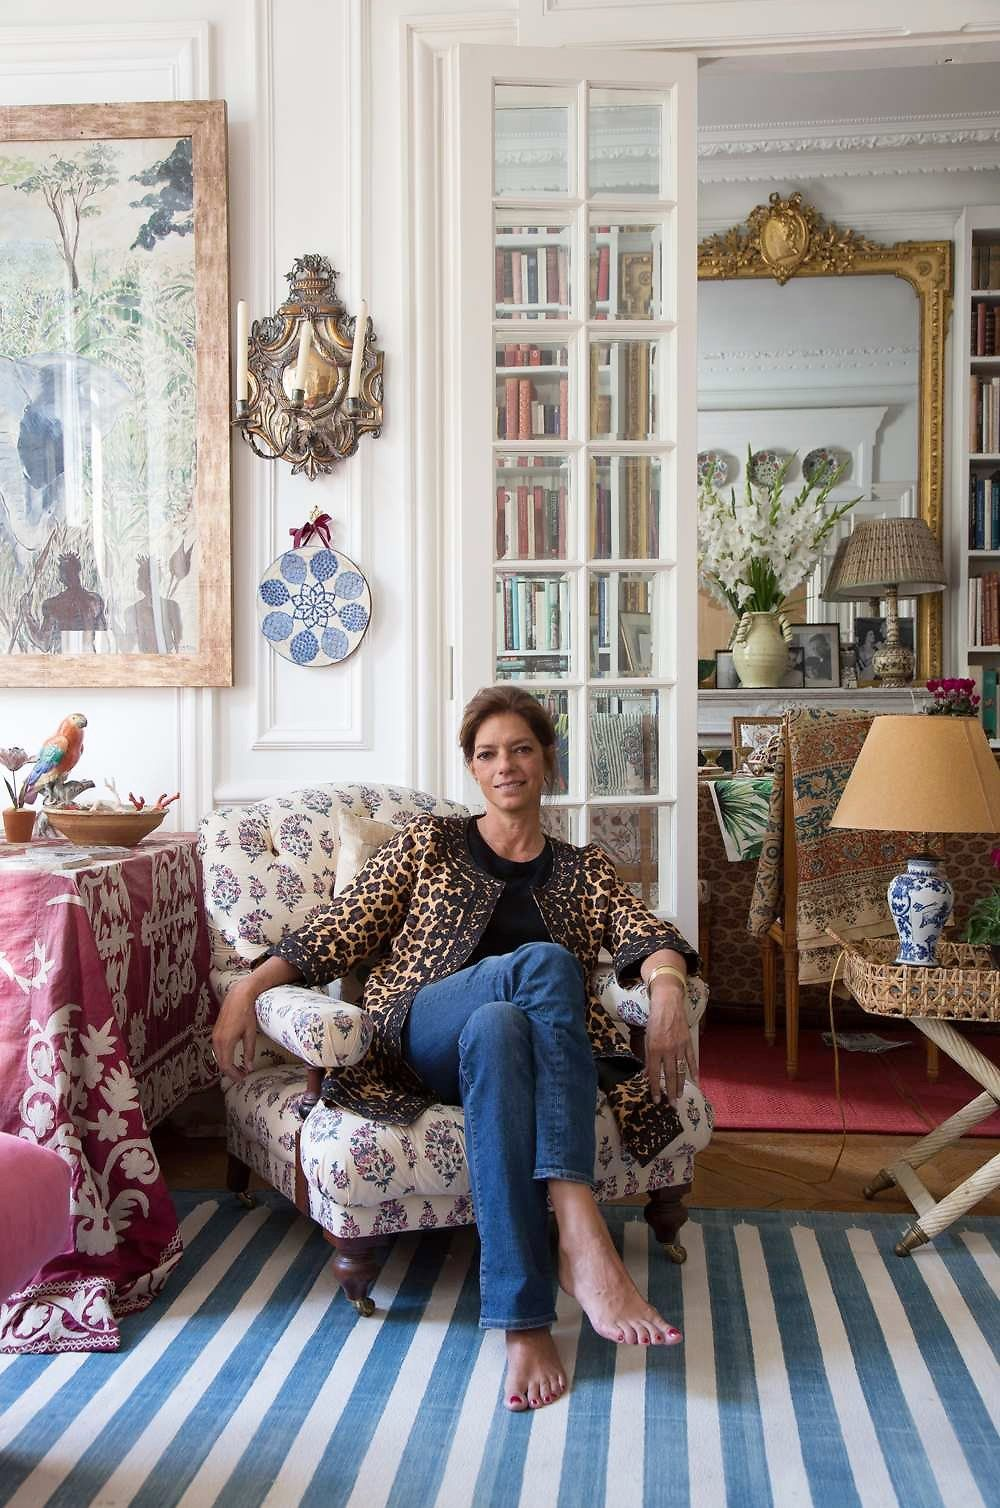 Carolina Irving S Paris Apartment Take 2 Katie Considers